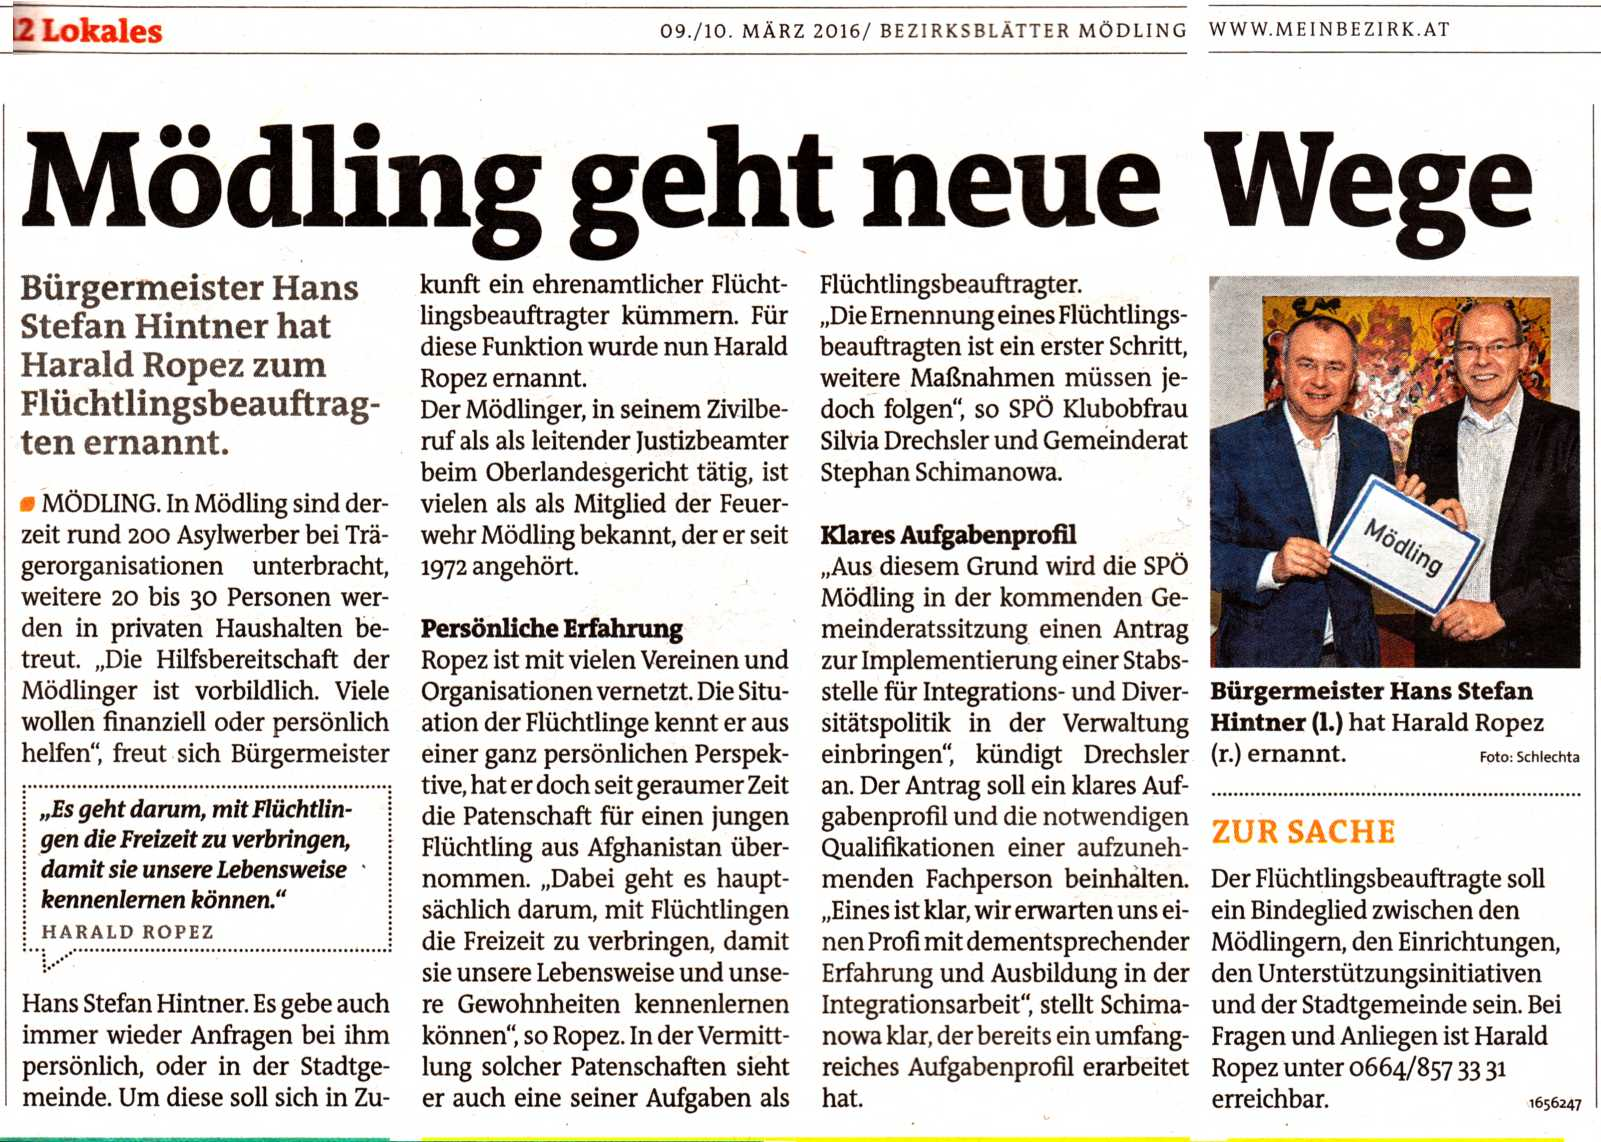 BB 10-2016 -Mödling_geht_neue_Wege